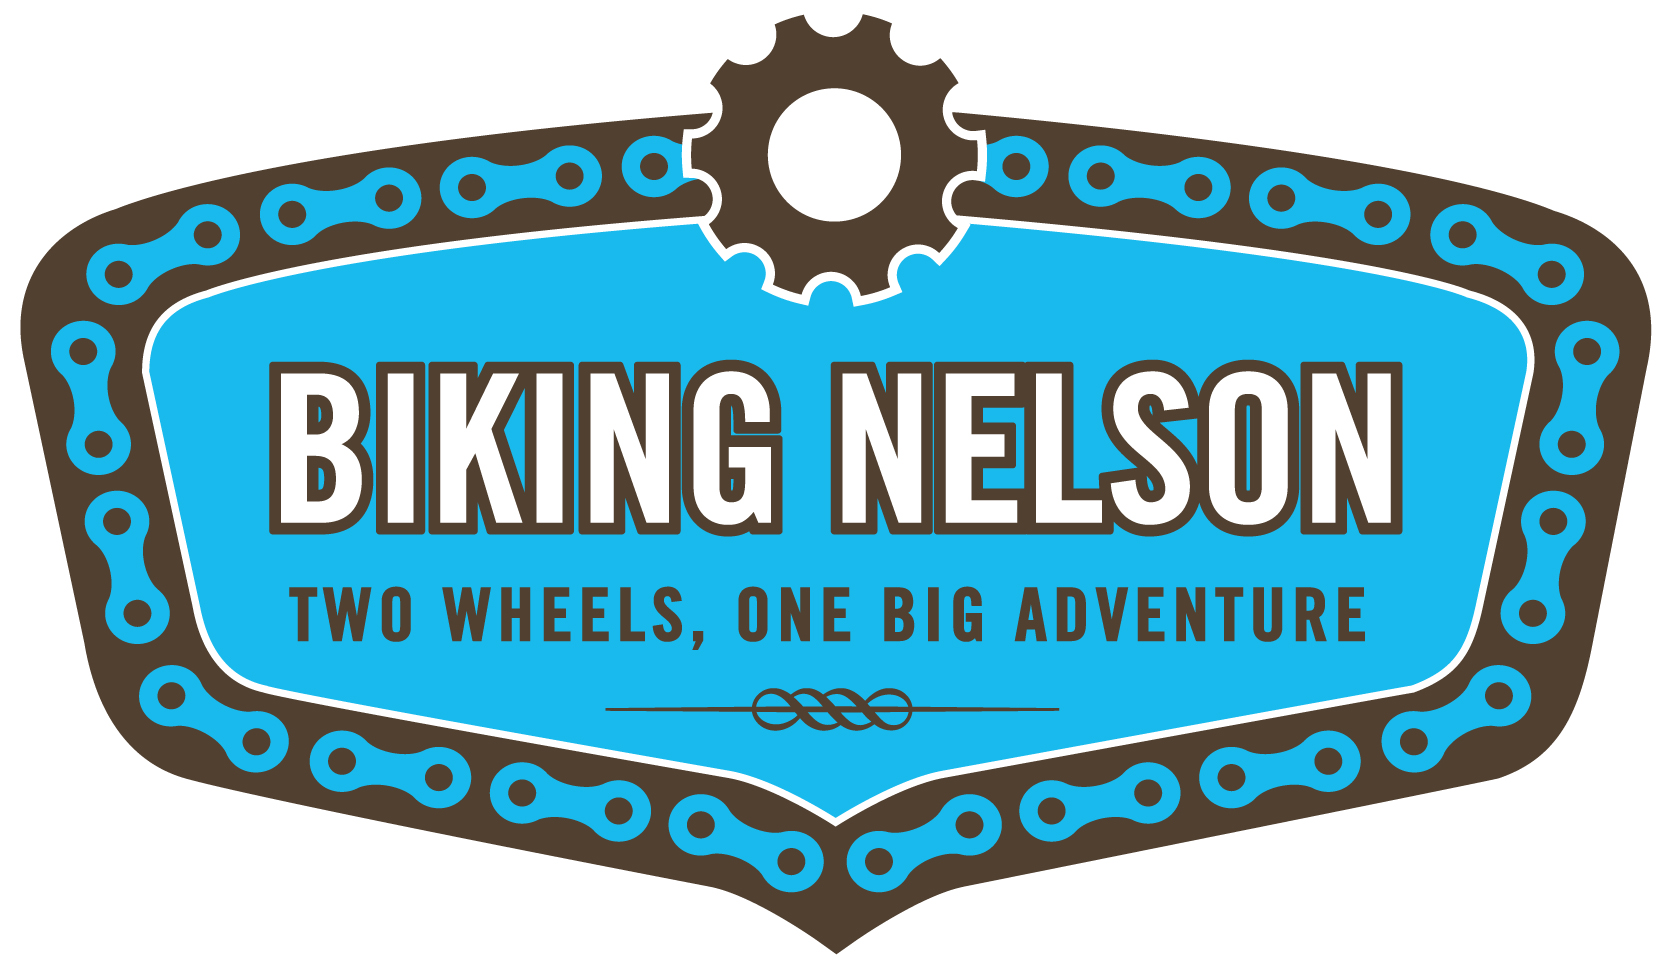 Biking Nelson